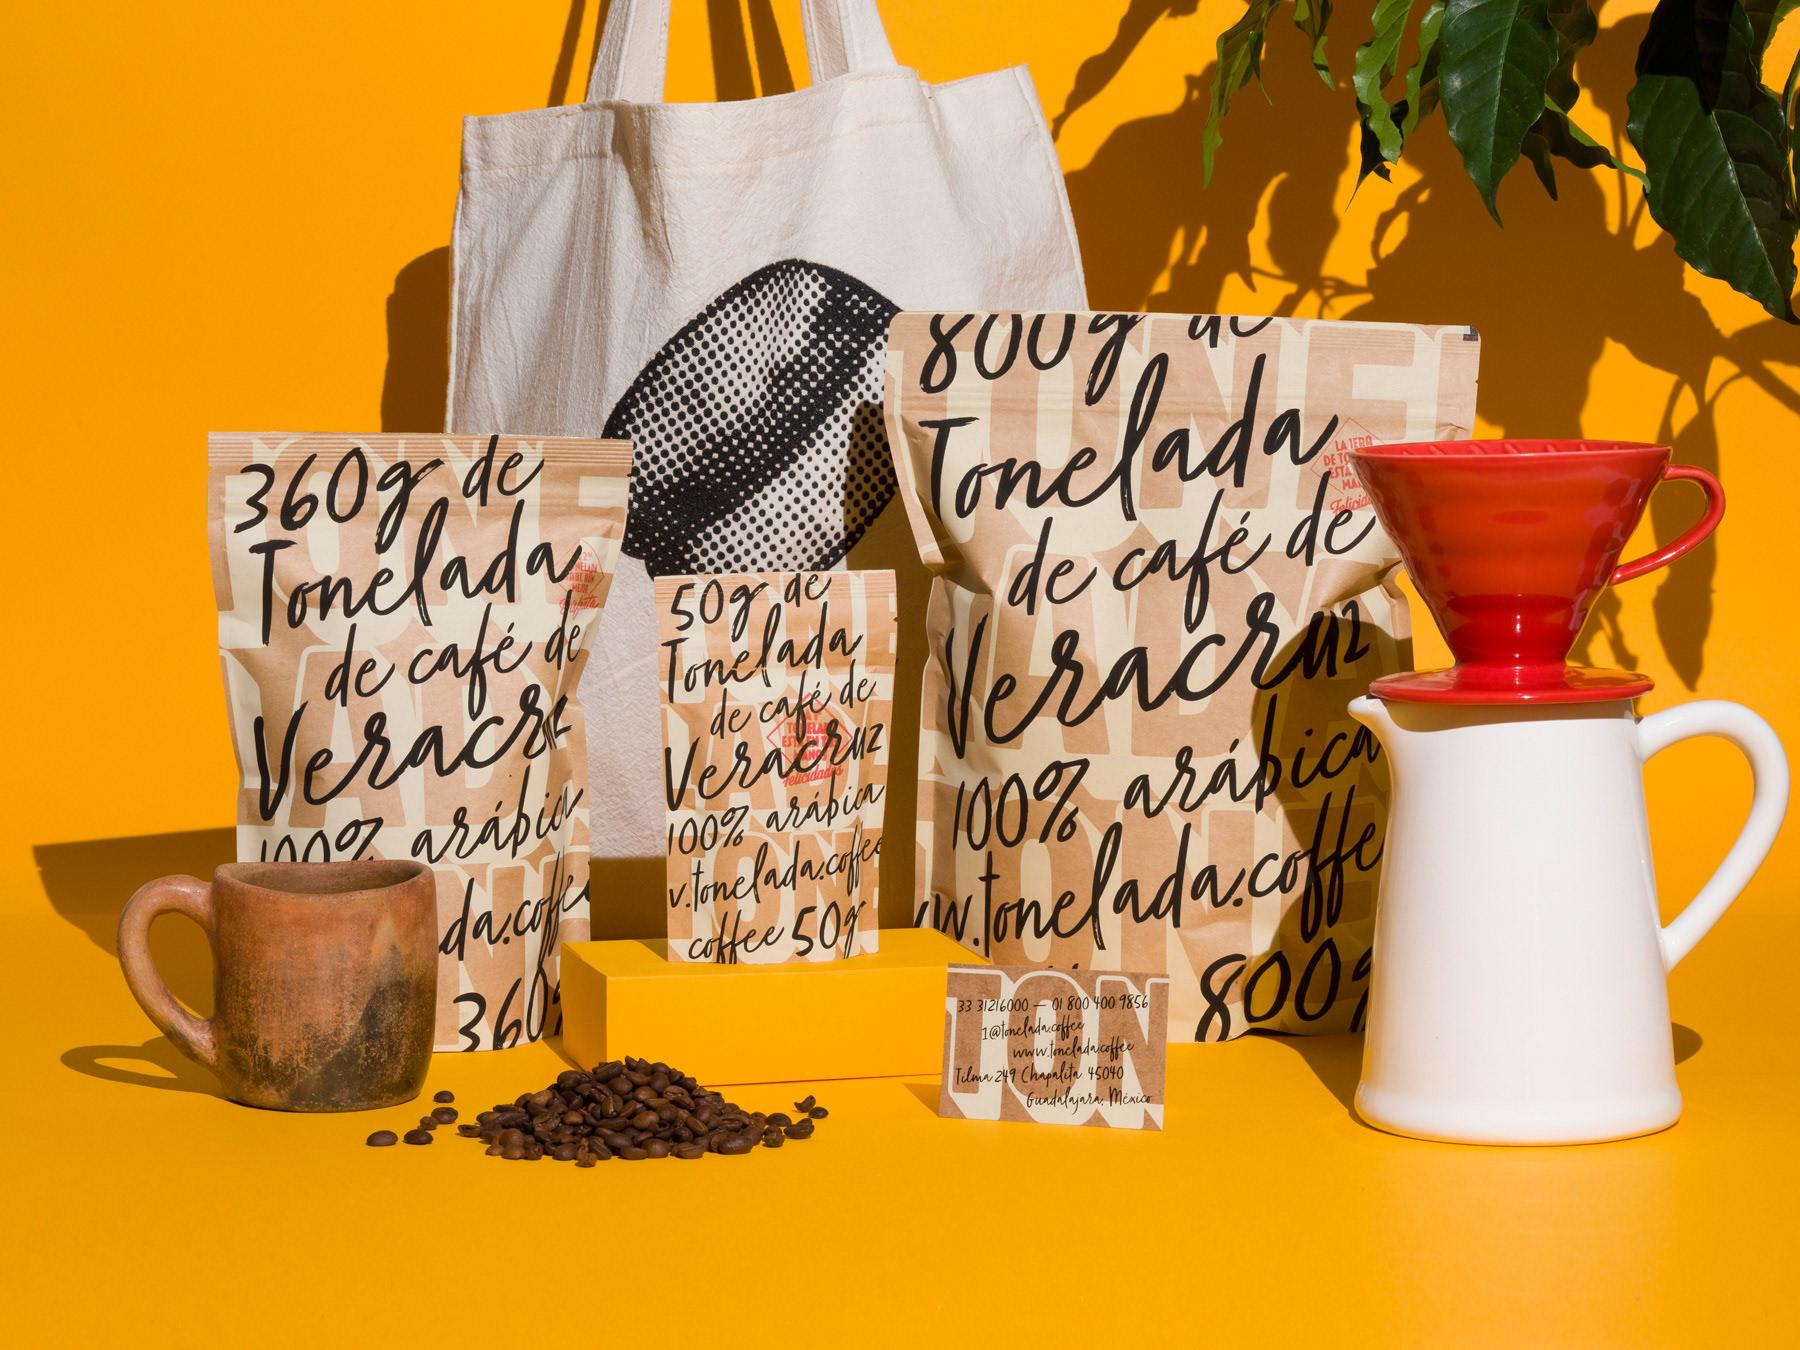 design work tonelada coffee